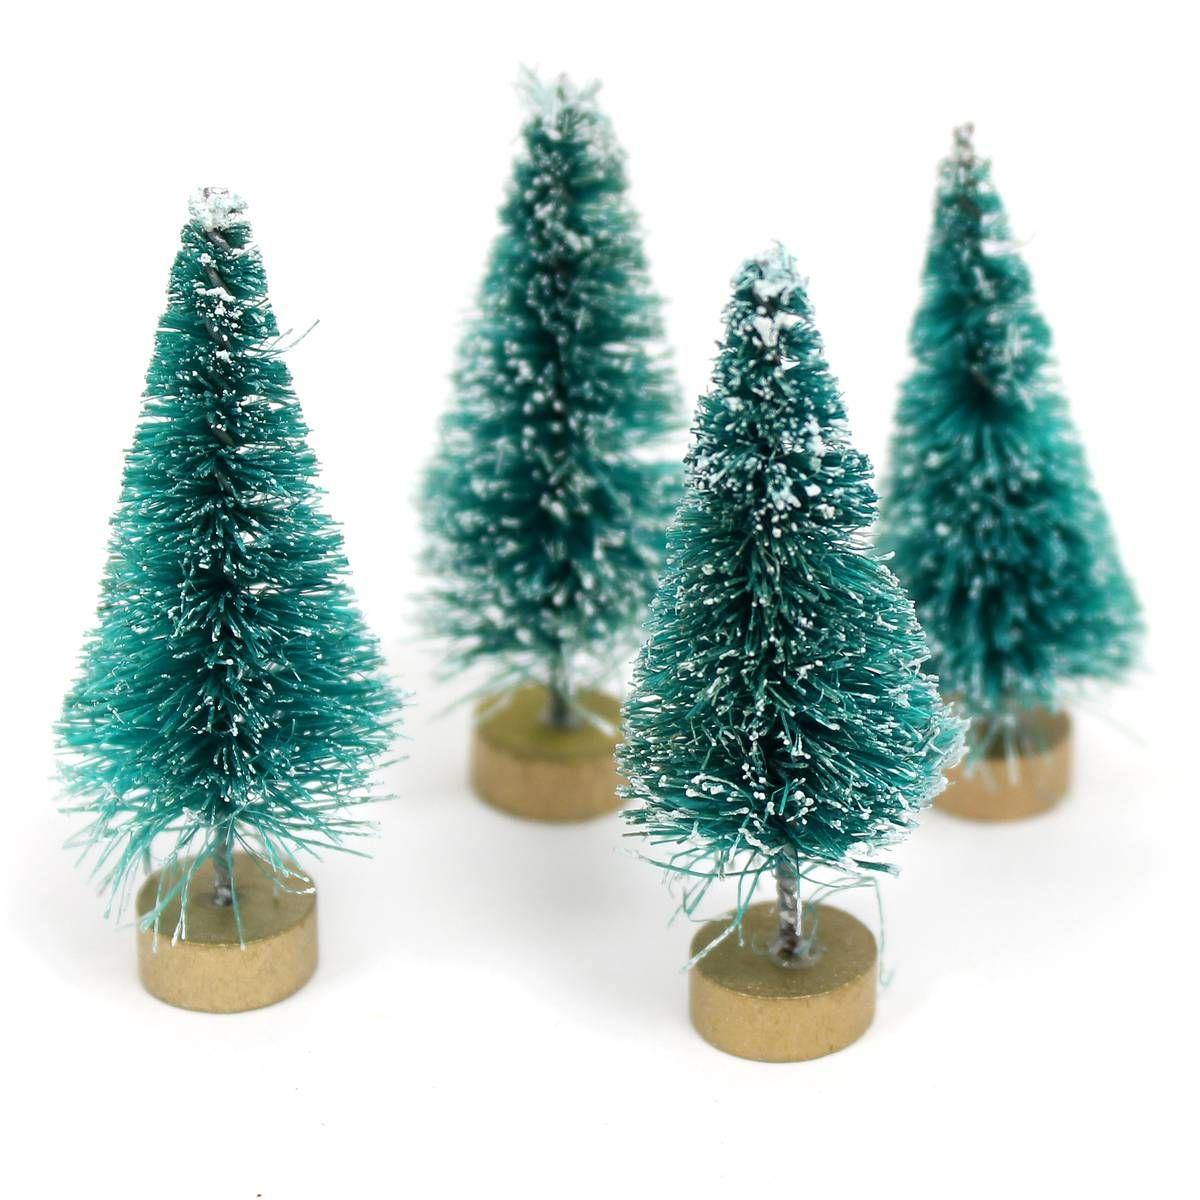 Mini bottlebrush christmas tree bauble fillers 4 pack hobbycraft mini bottlebrush christmas tree bauble fillers 4 pack hobbycraft solutioingenieria Images